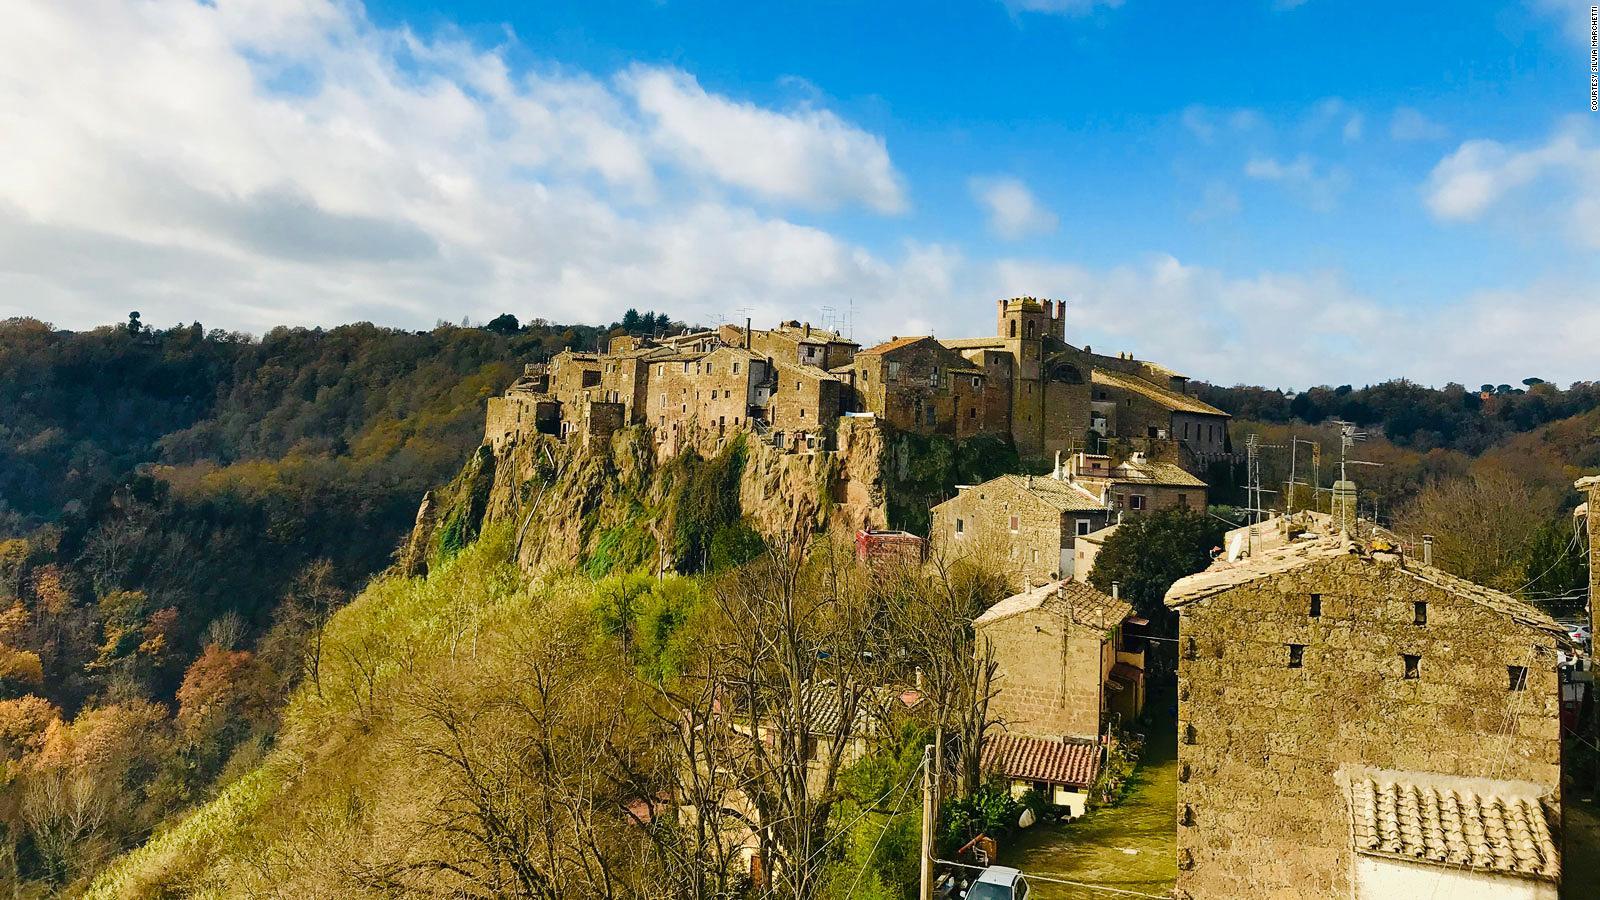 20 Beatufiul Italian Villages To Visit Cnn Travel